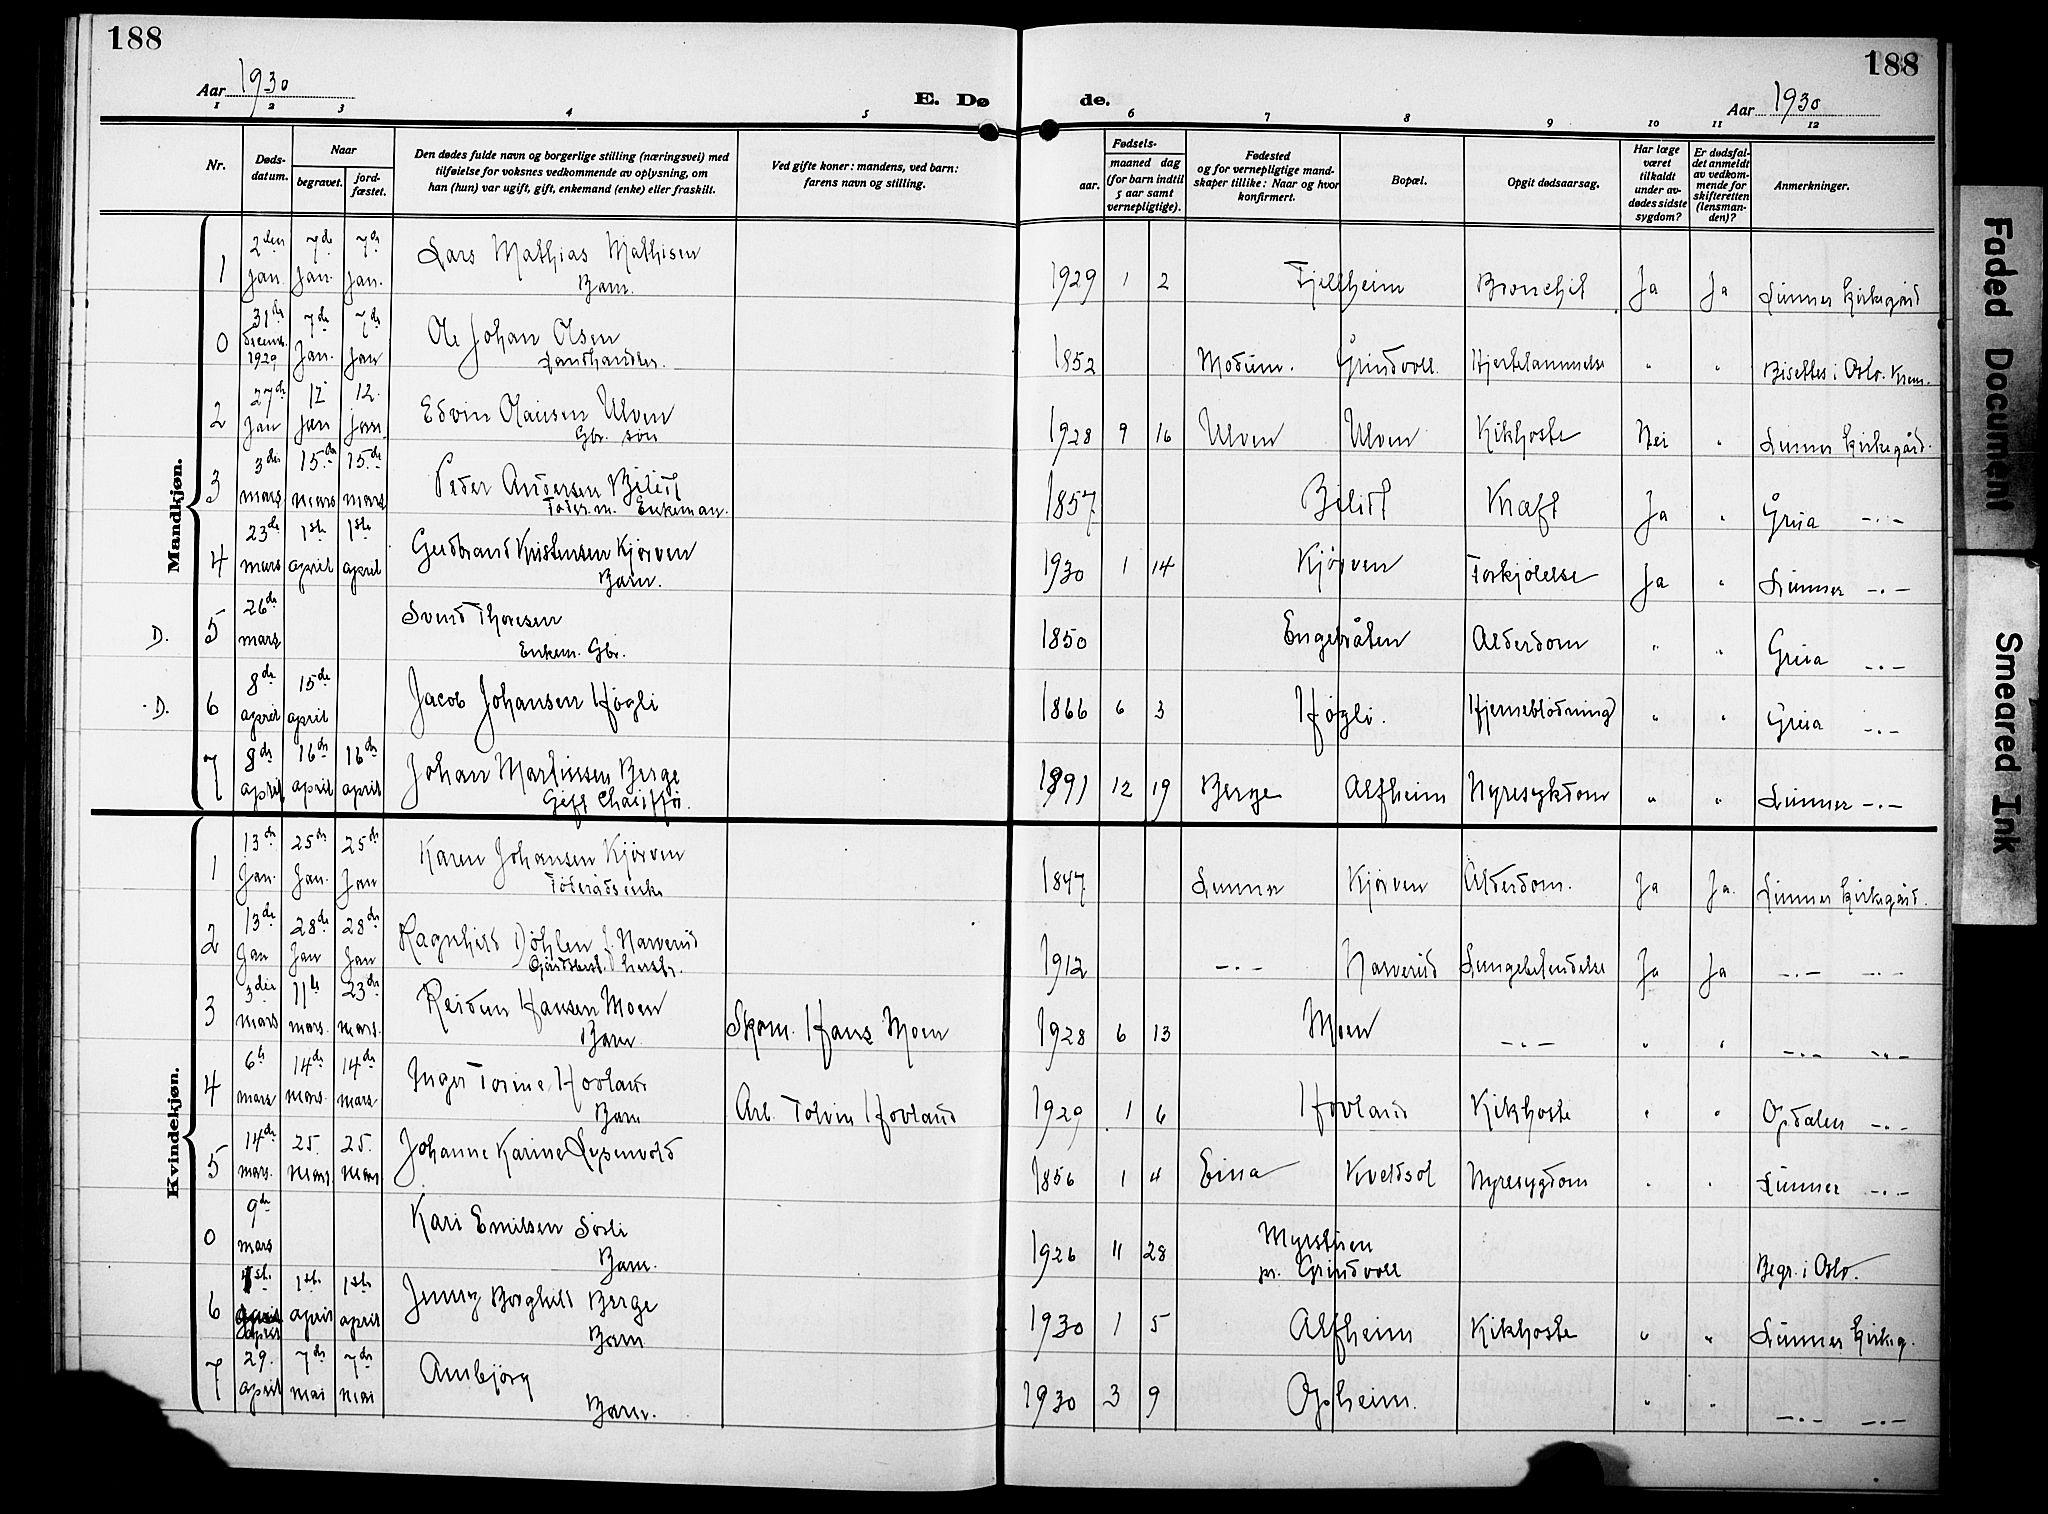 SAH, Lunner prestekontor, H/Ha/Hab/L0002: Klokkerbok nr. 2, 1923-1933, s. 188